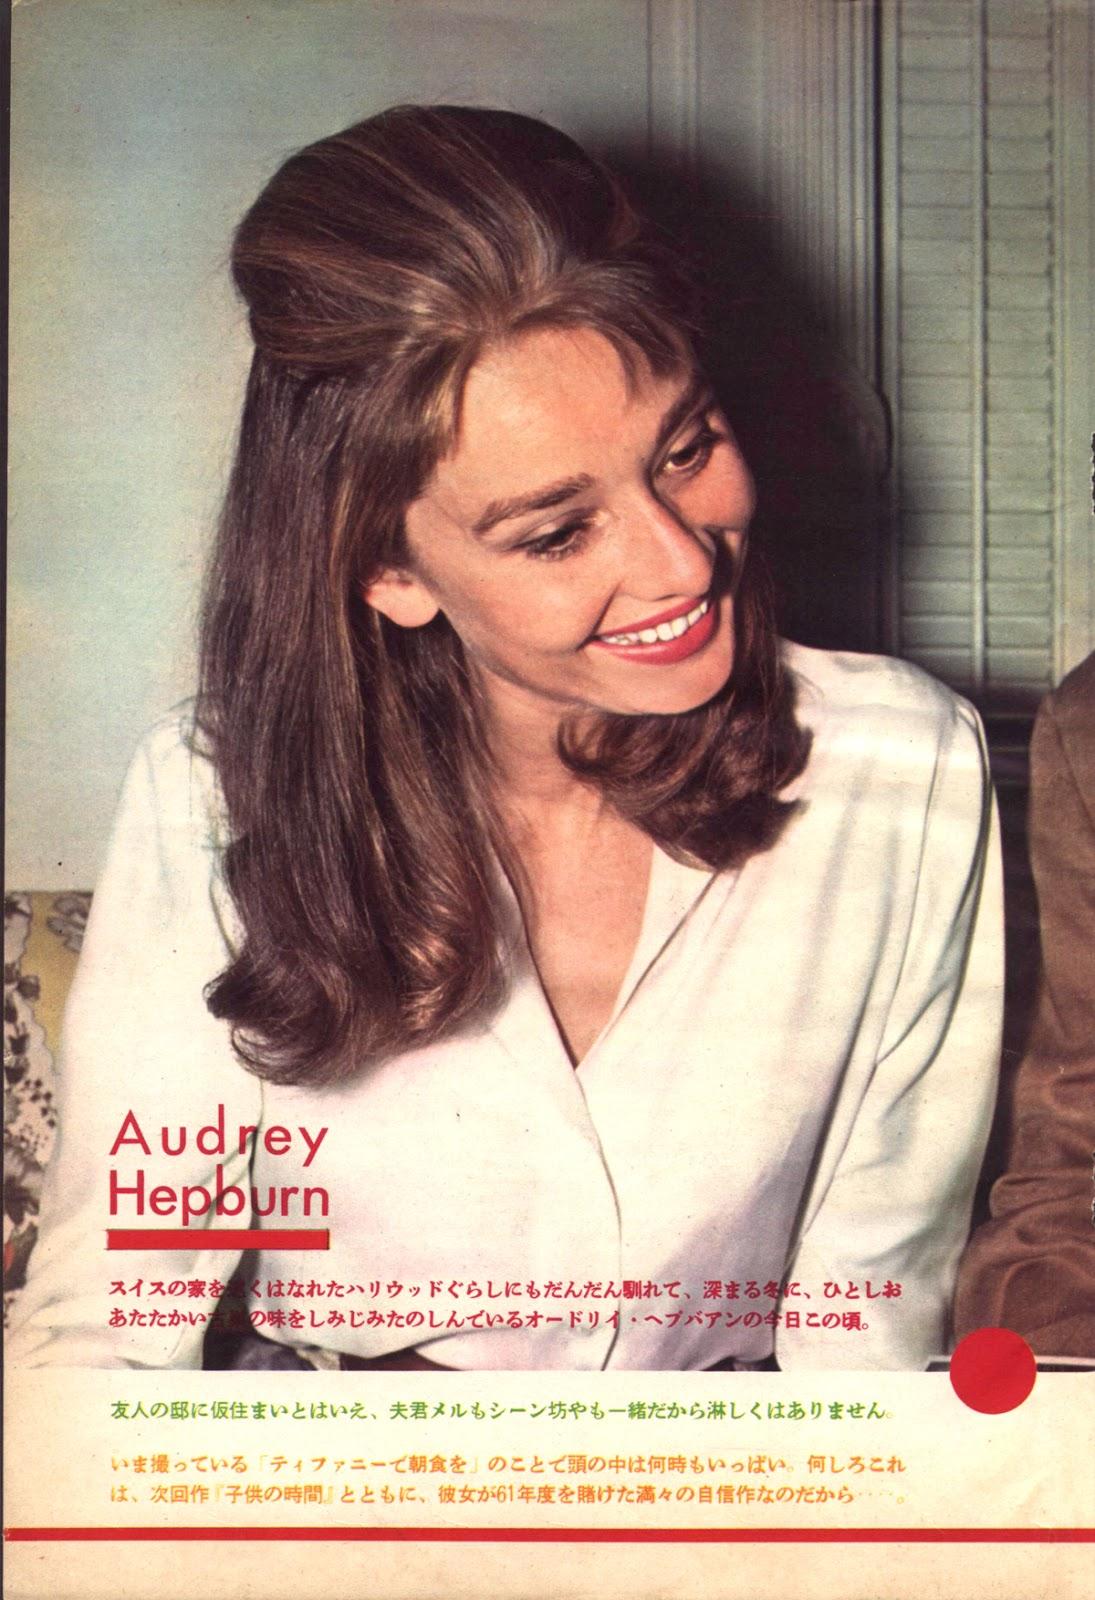 Awe Inspiring Celebrity Hairstyle Haircut Ideas Audrey Hepburn Hairstyles Short Hairstyles For Black Women Fulllsitofus